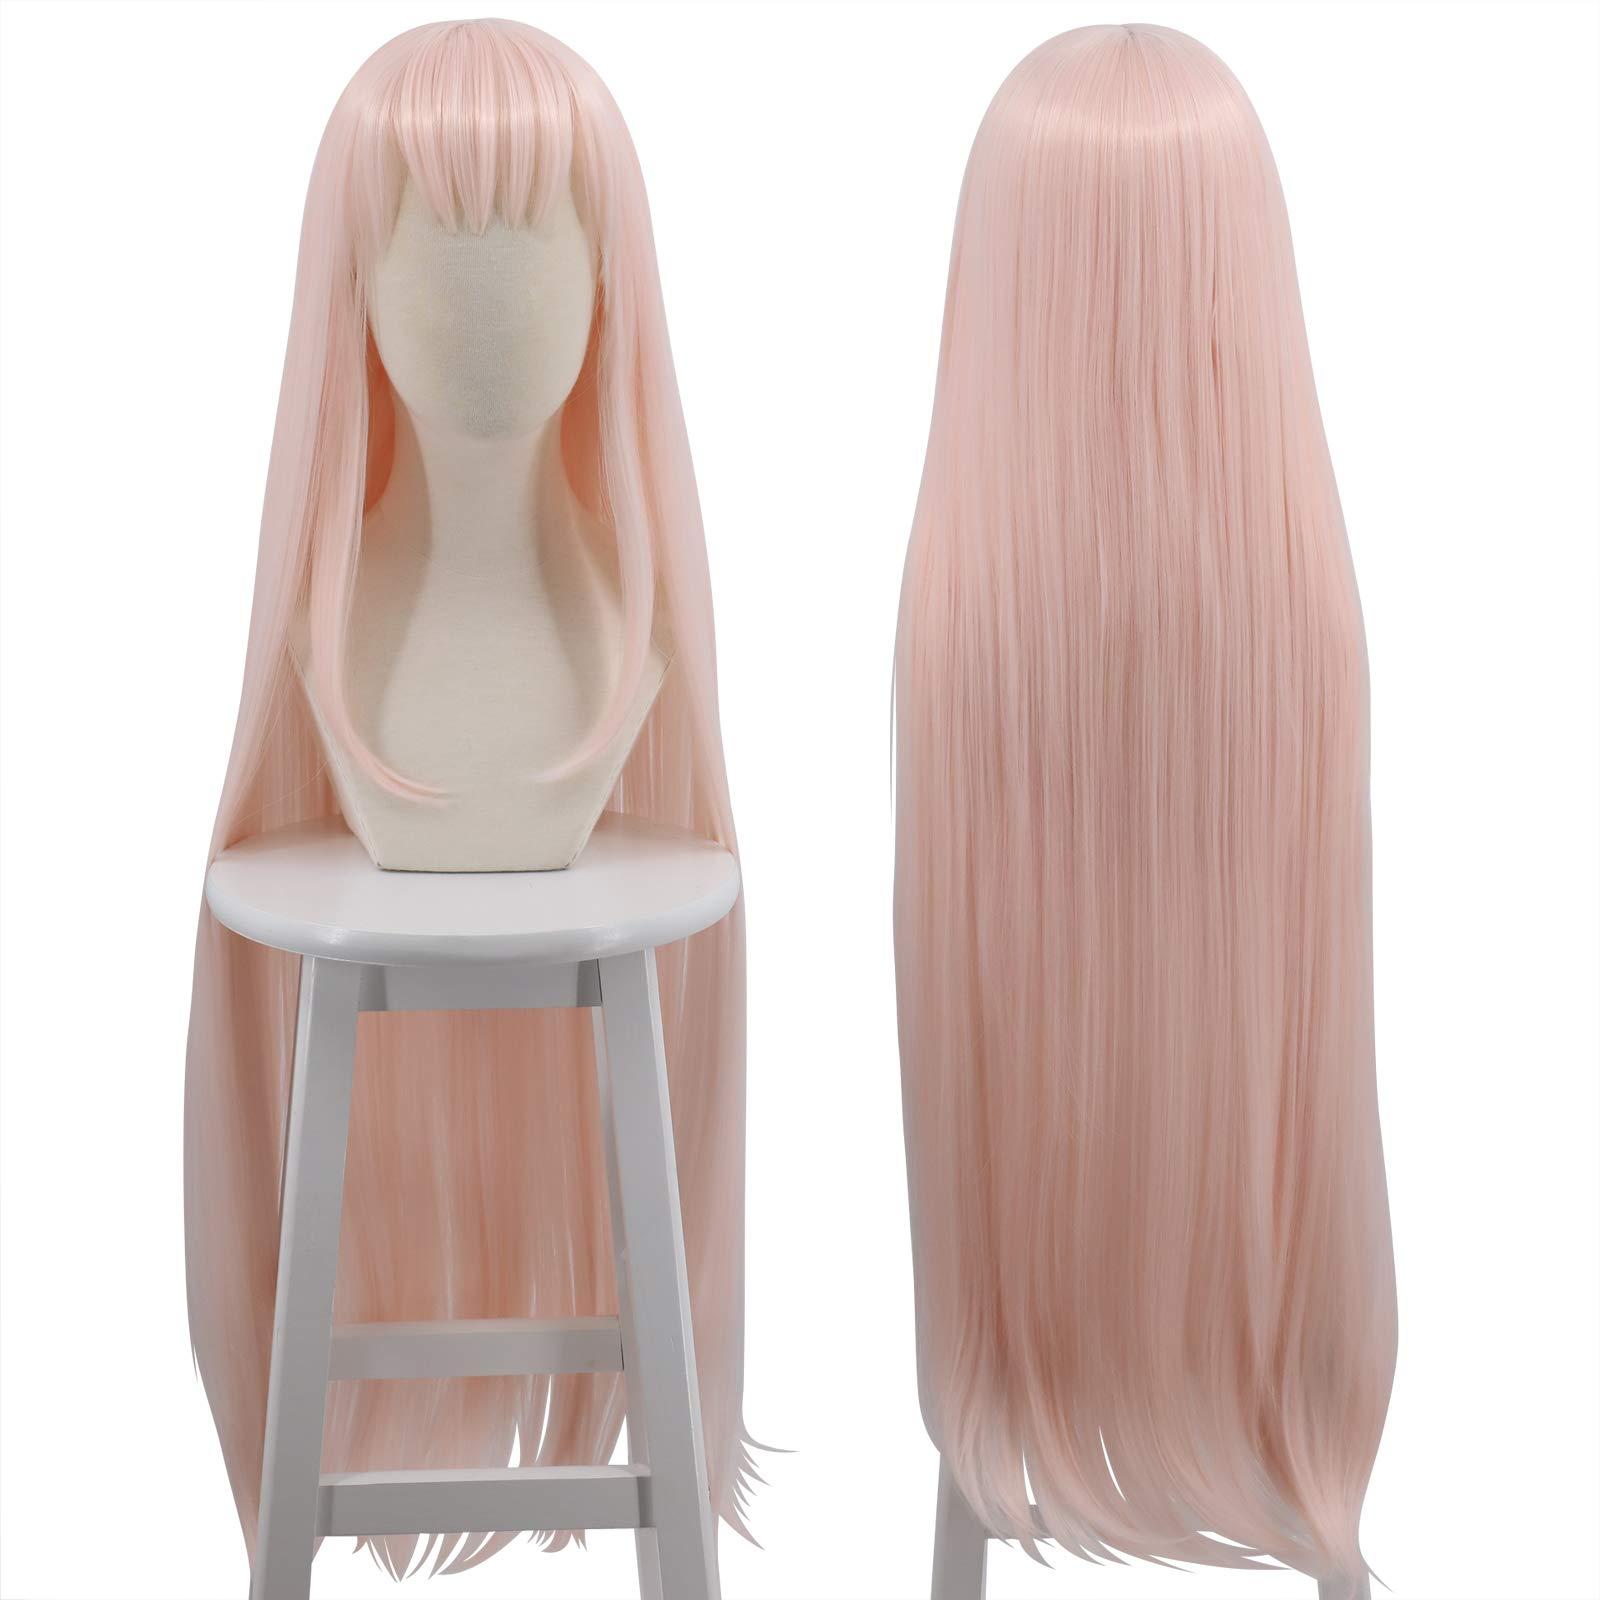 Cfalaicos 1M ZERO TWO Code 002 Cosplay Wig Long Straight Pink Costume Wig